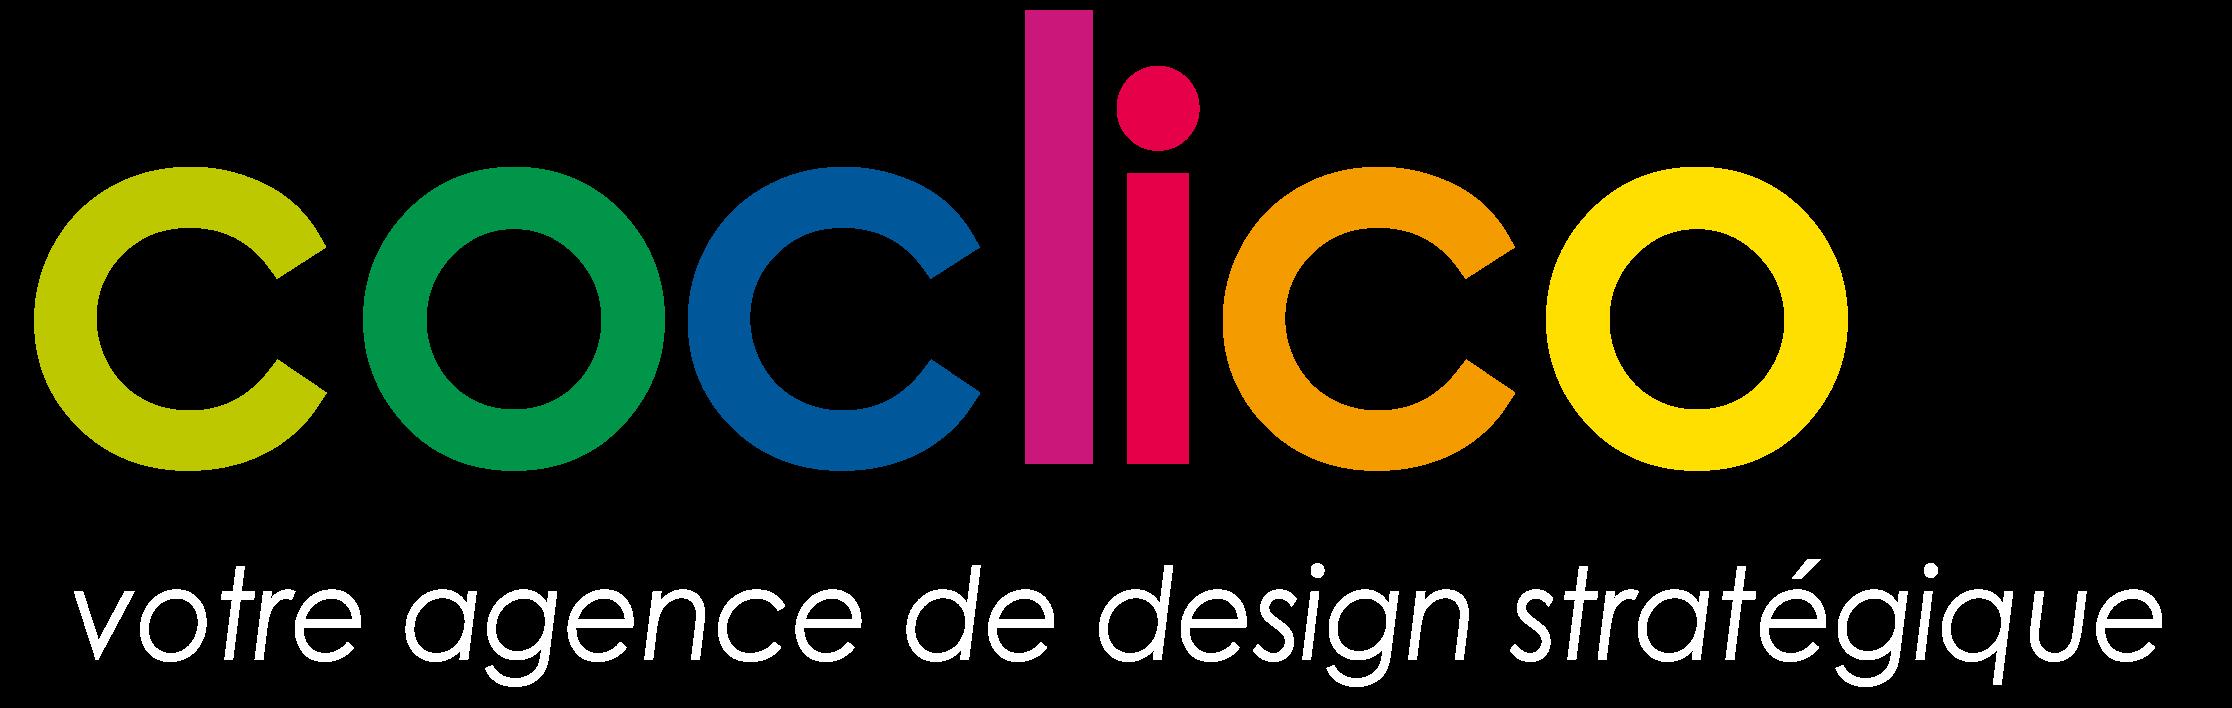 coclico